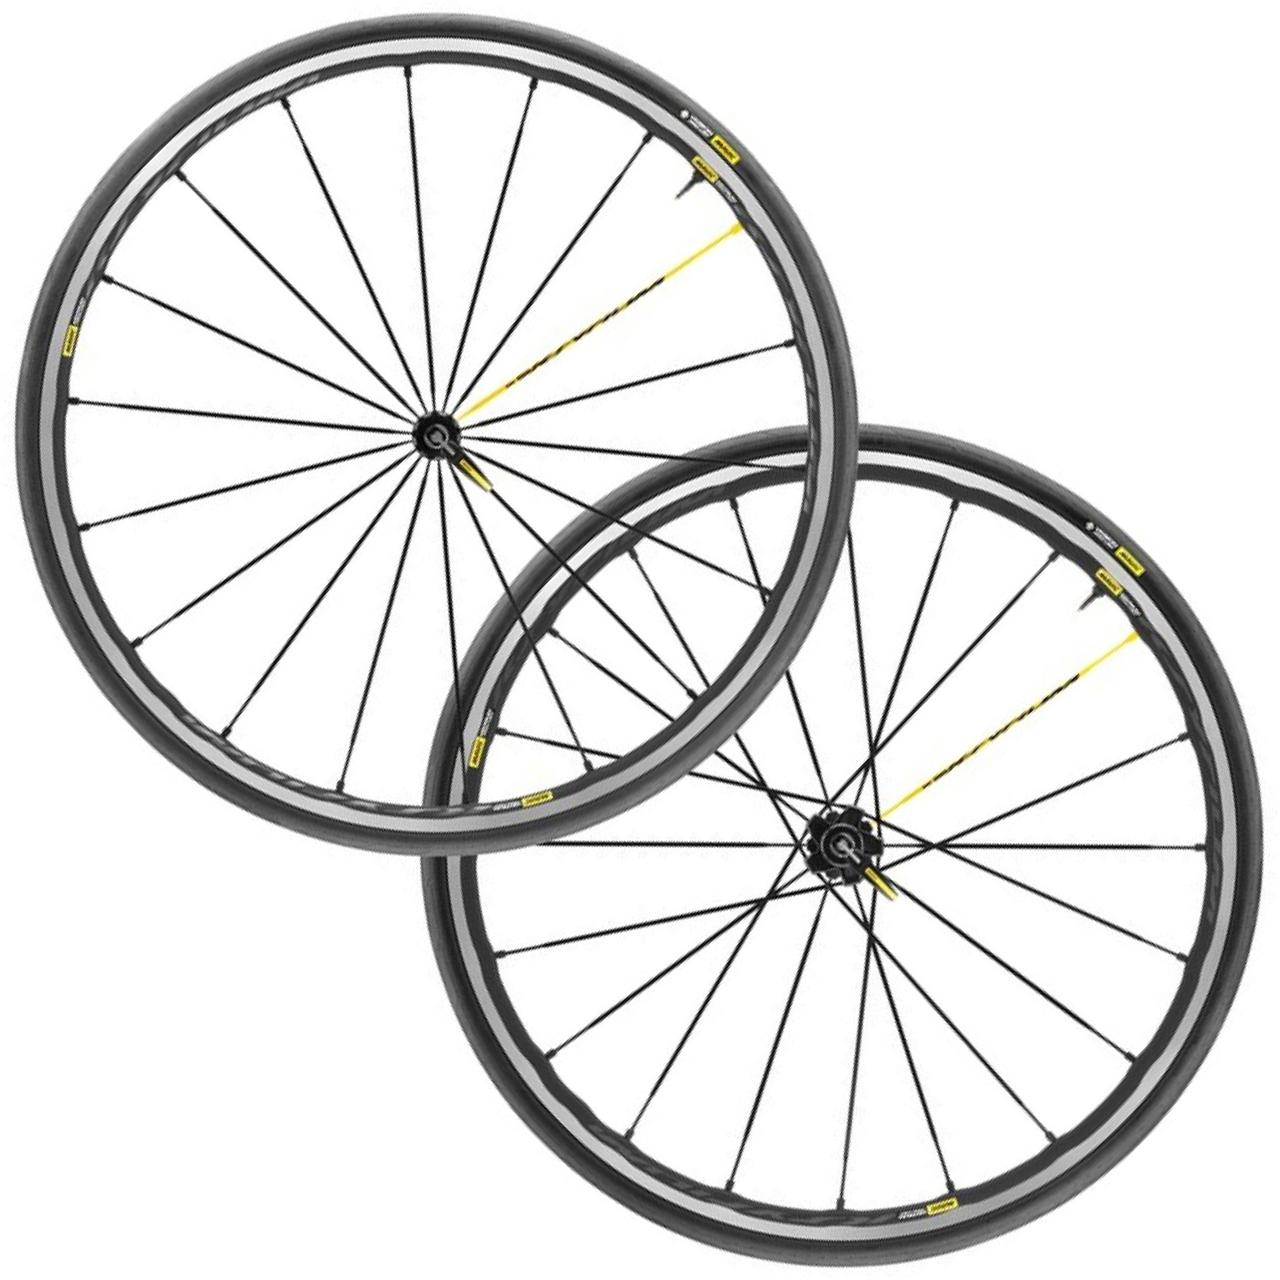 Mavic Ksyrium Pro UST Road Wheels - 2018